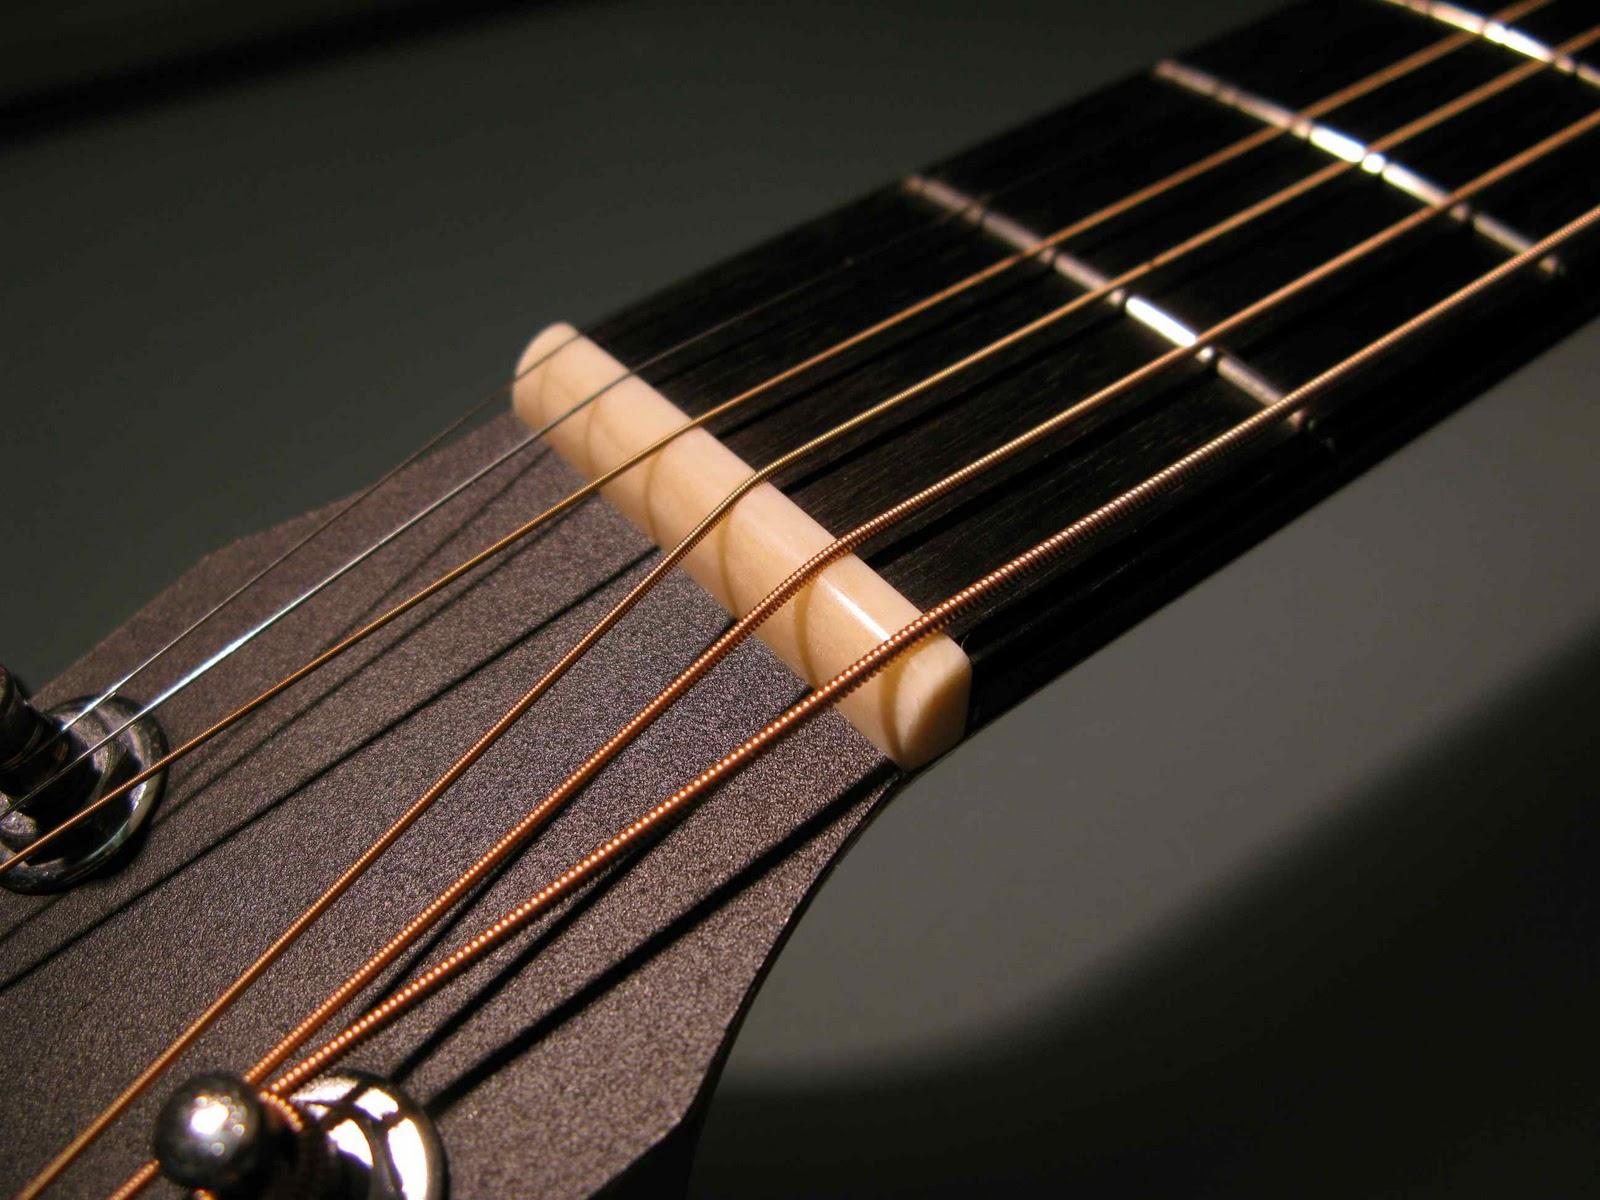 guitaring passionately bite size tips 002 string height nut. Black Bedroom Furniture Sets. Home Design Ideas